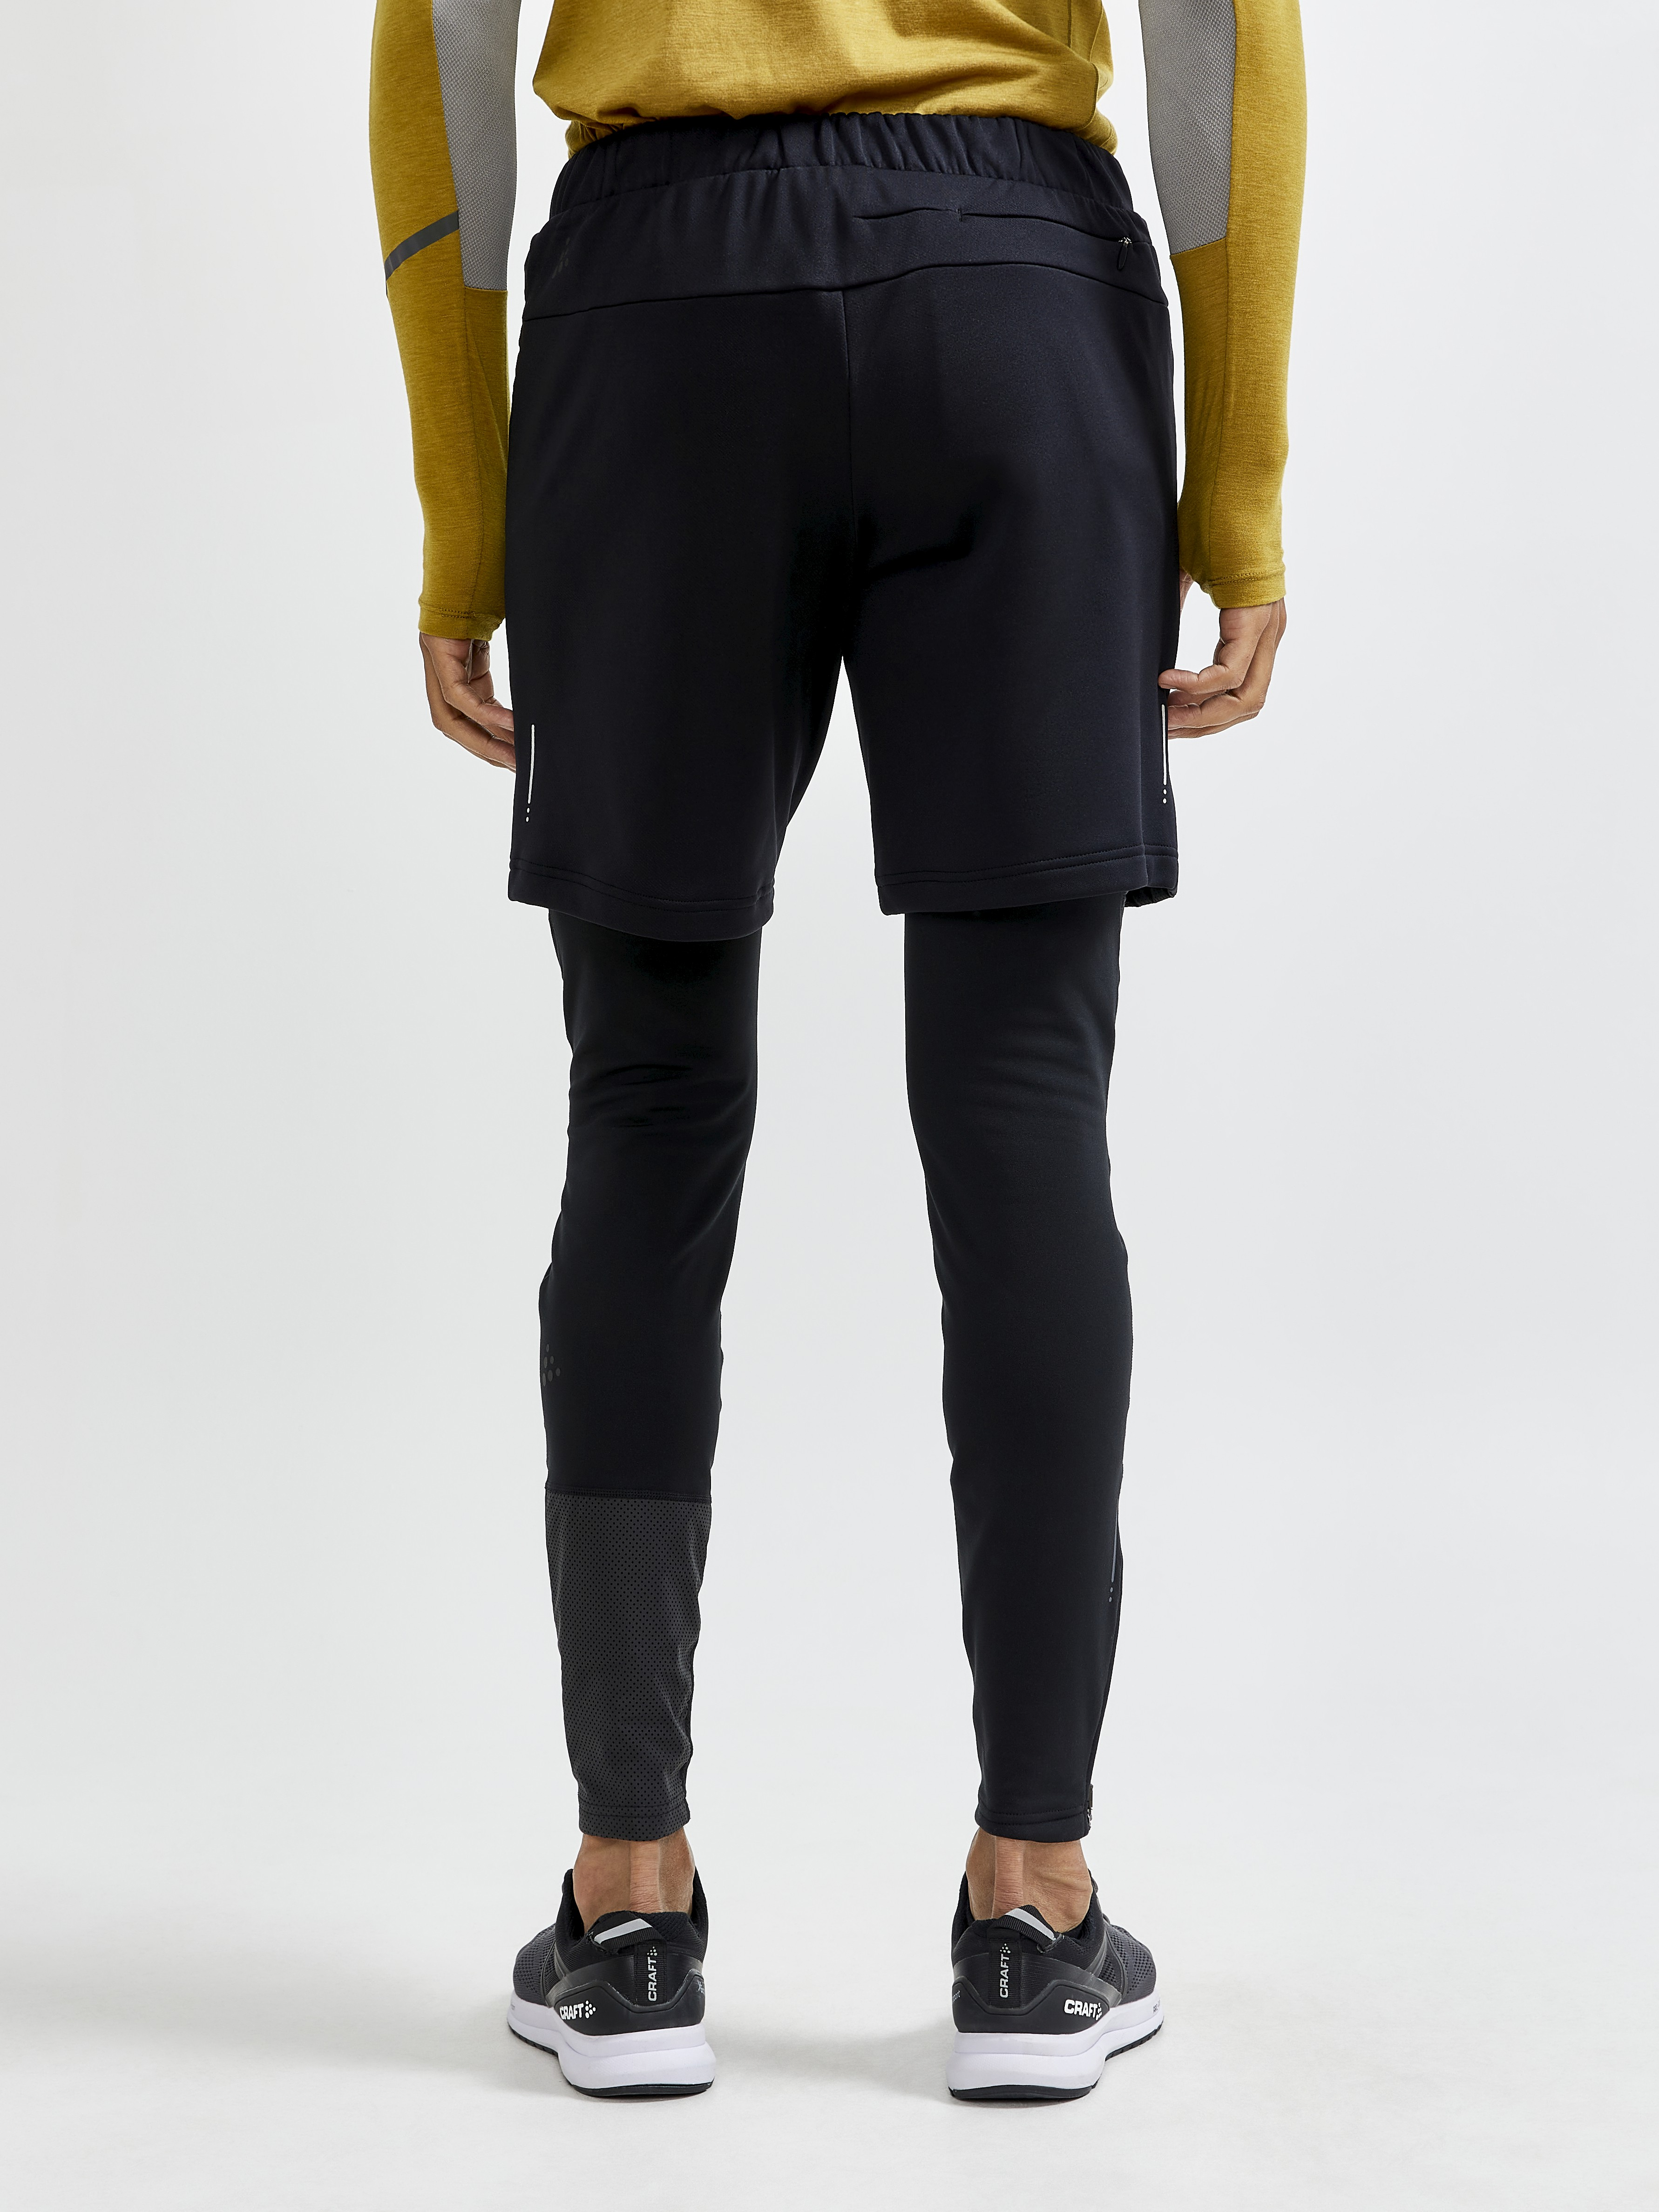 Craft Lumen SubZ Shorts Herren Black 2020 Laufsport Shorts